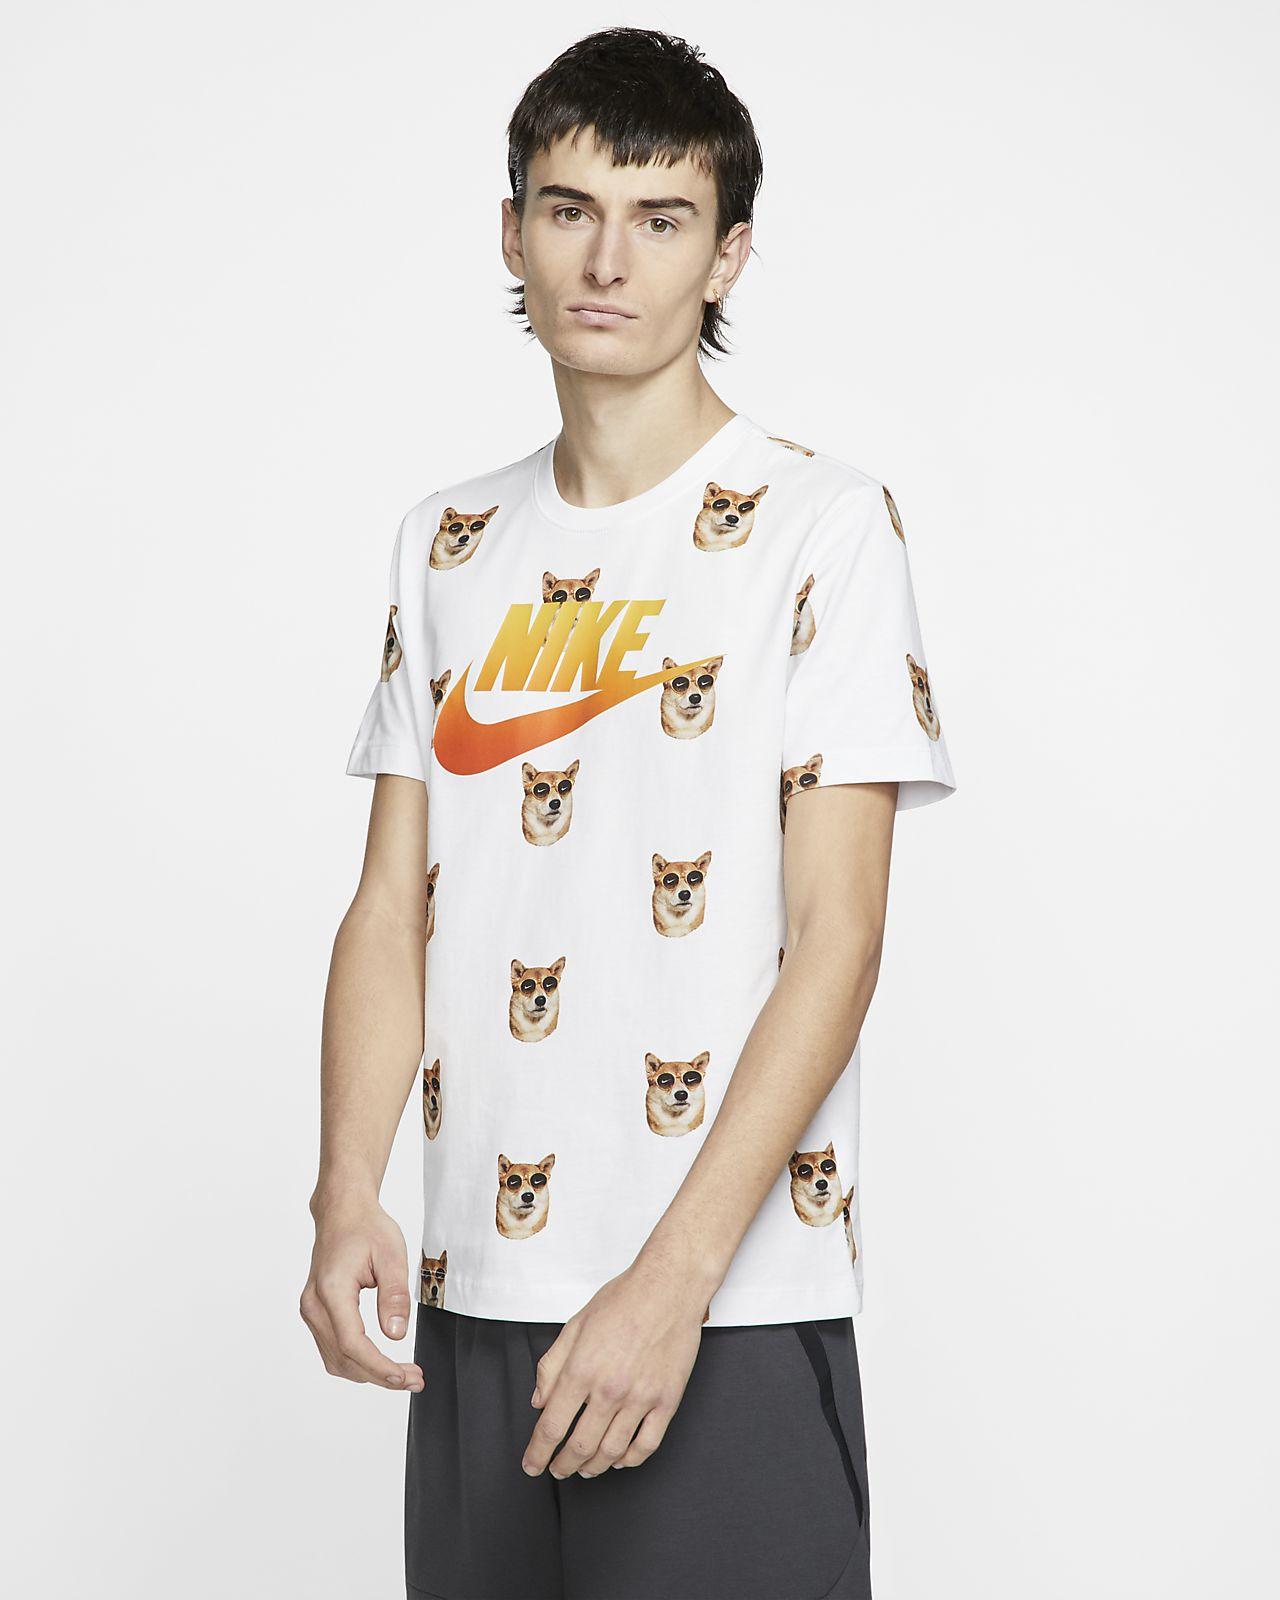 56526200d6d2bc Nike Sportswear Men's Printed T-Shirt. Nike.com ID